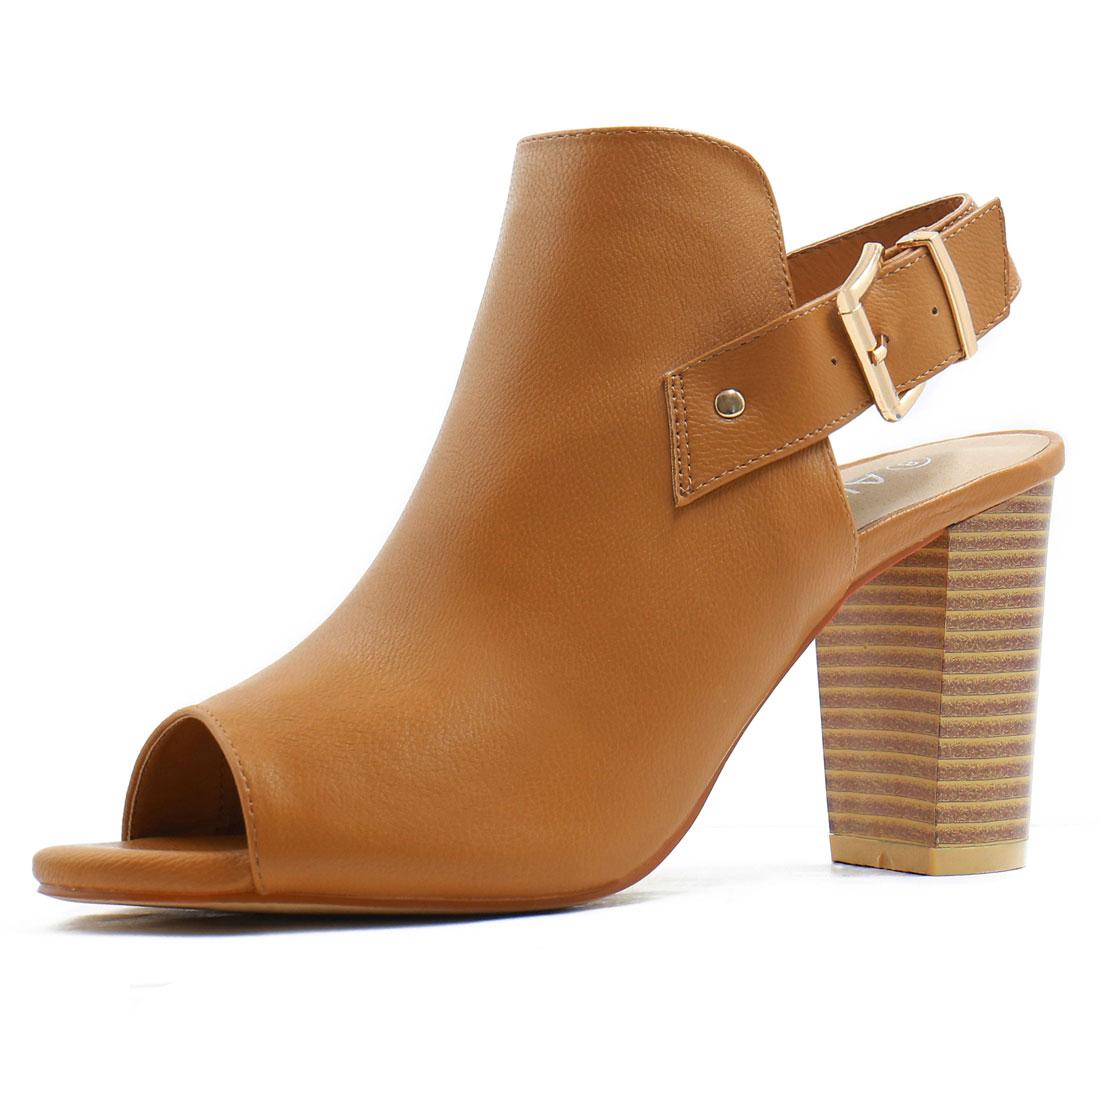 Women Peep Toe Slip On Stacked Heel Slingback Sandals Camel US 5.5